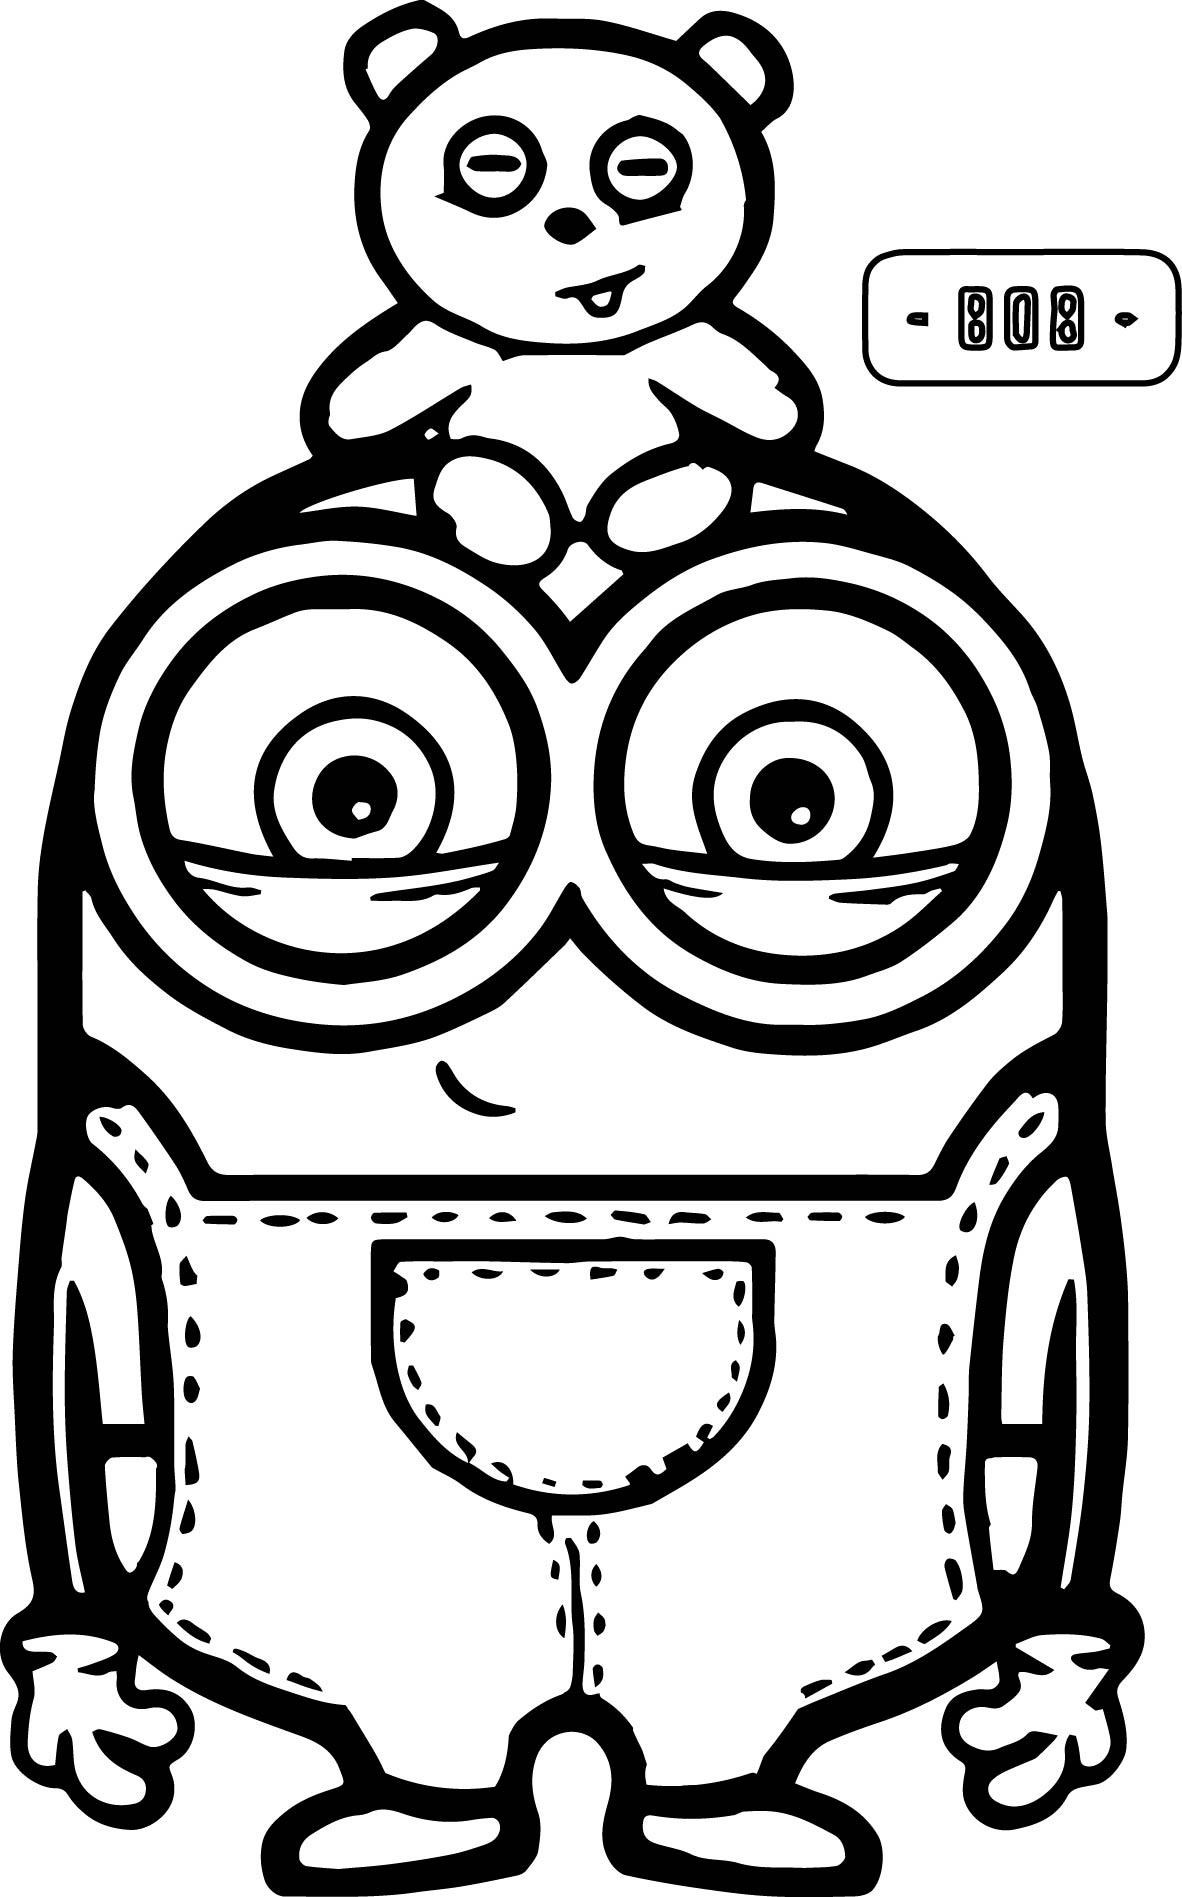 Cute-Bob-And-Bear-Minions-Coloring-Page